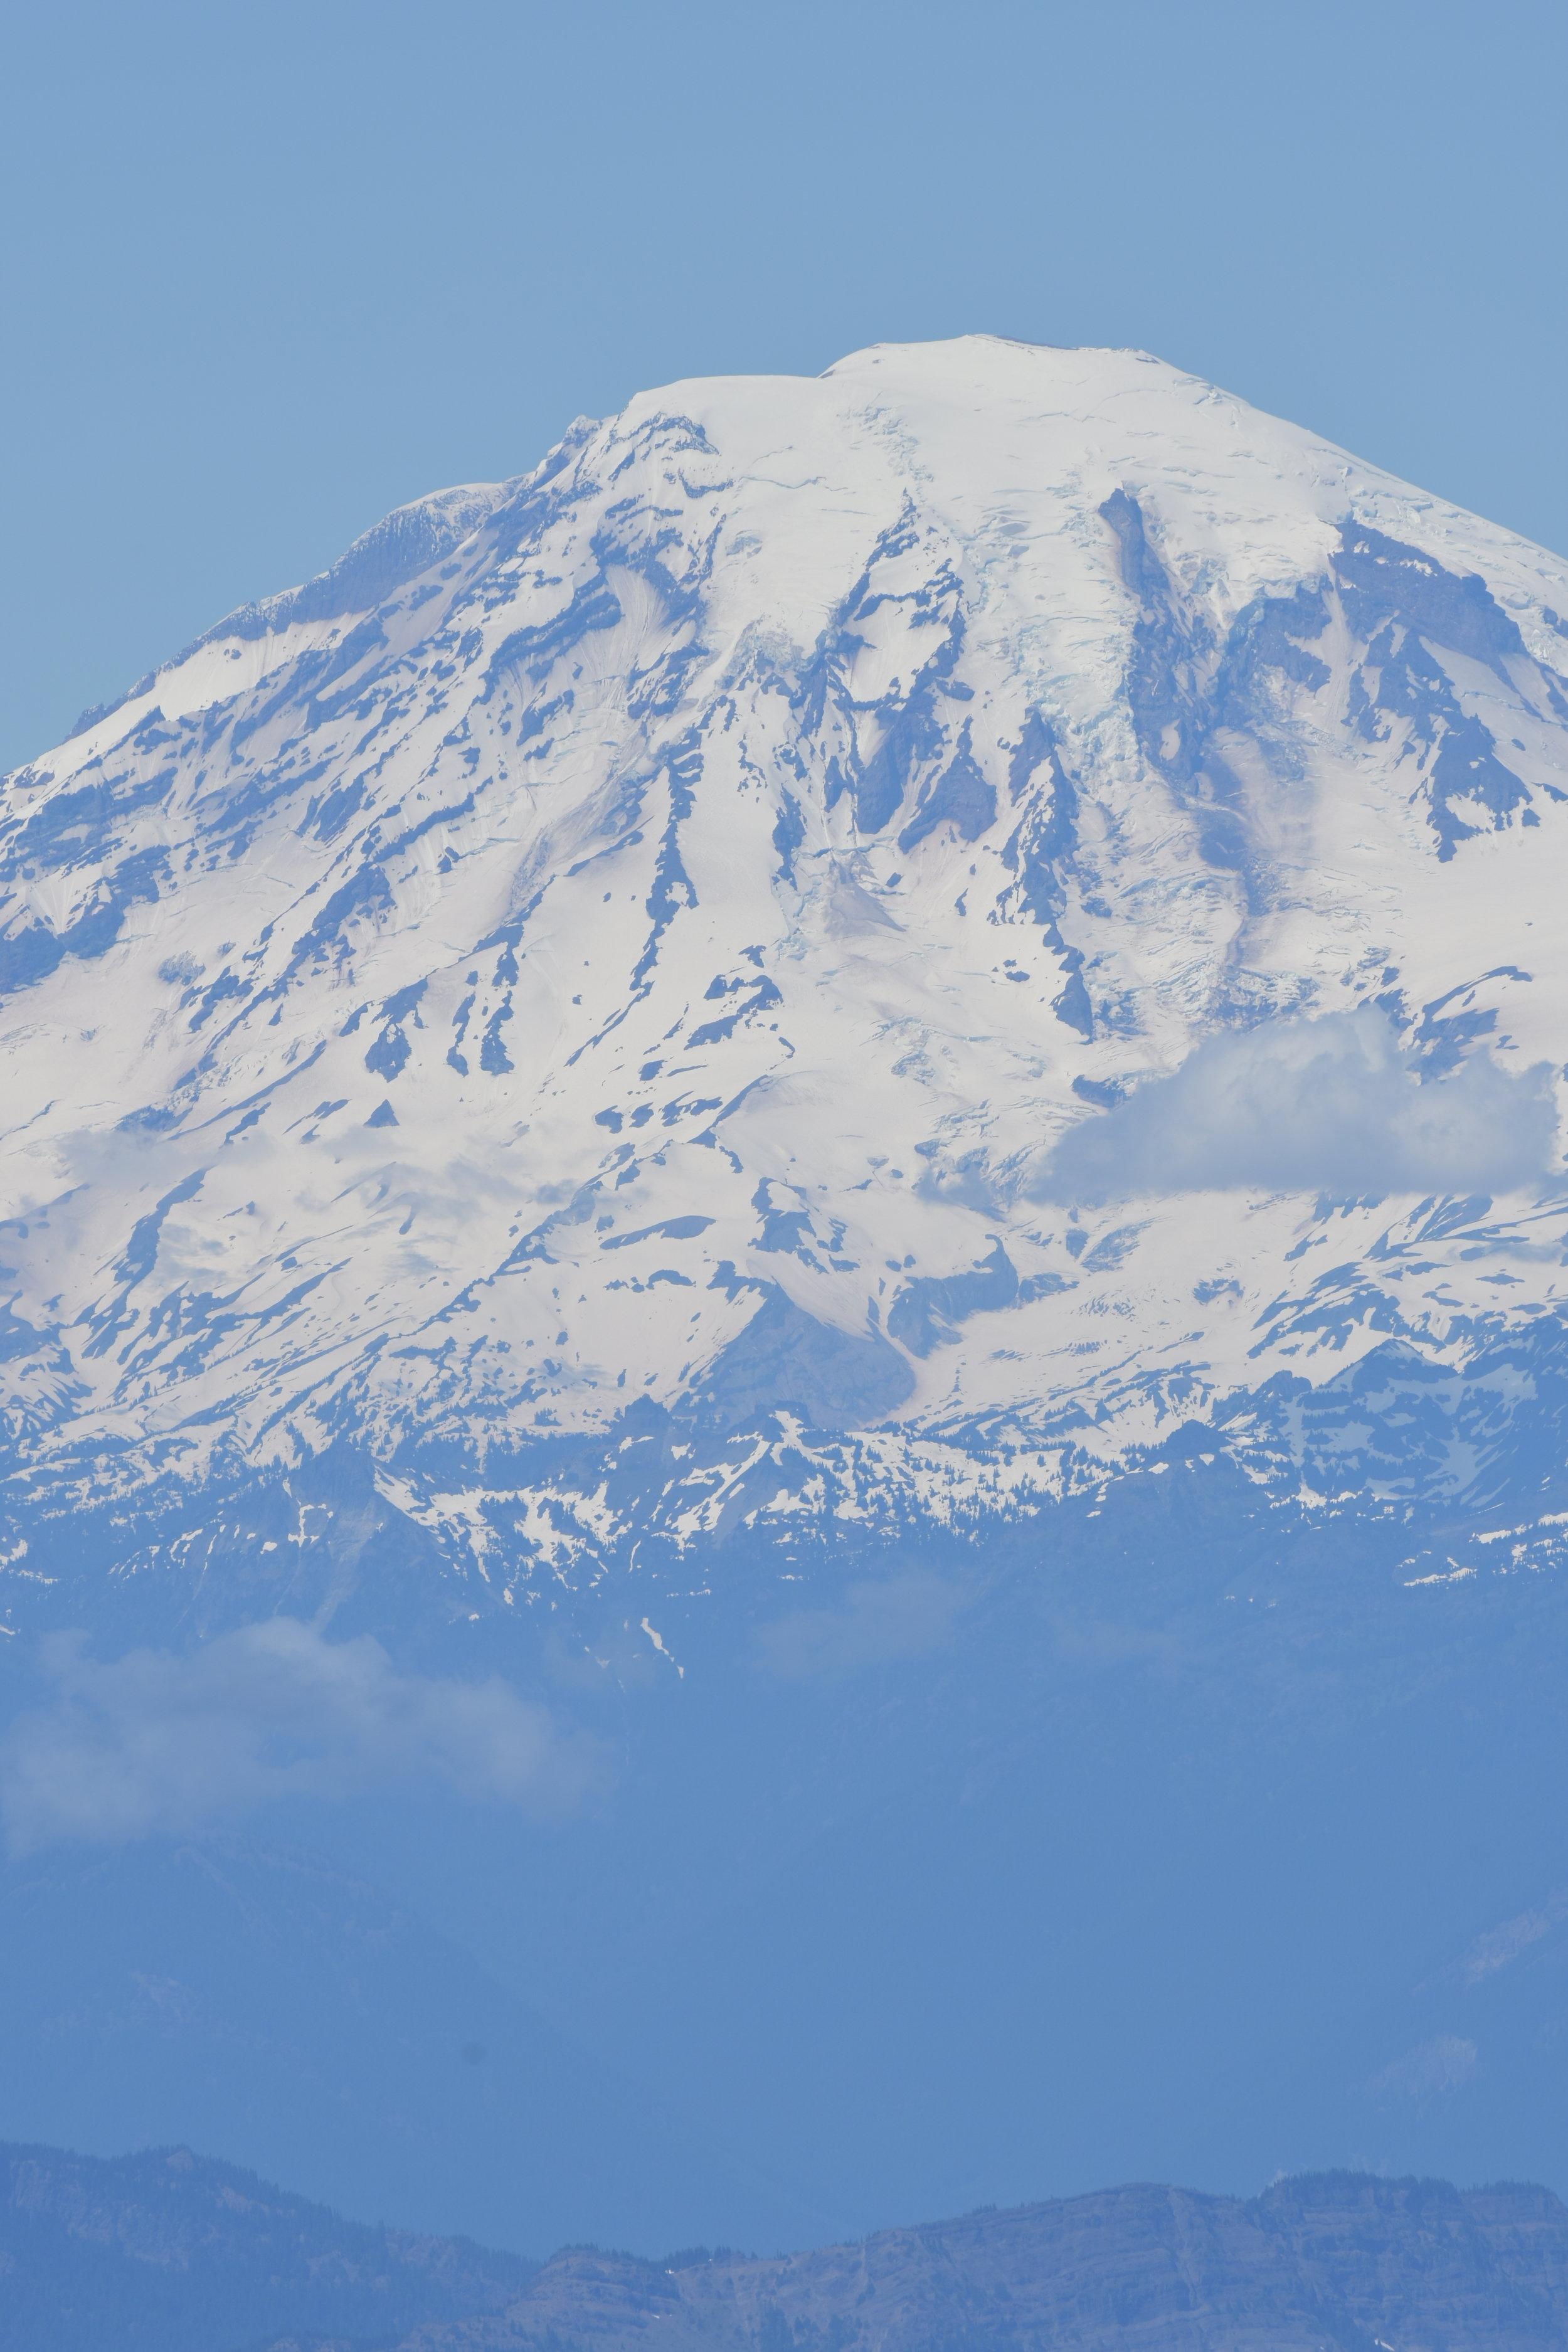 Fun frame with Mt. Rainier from Mt. Adams